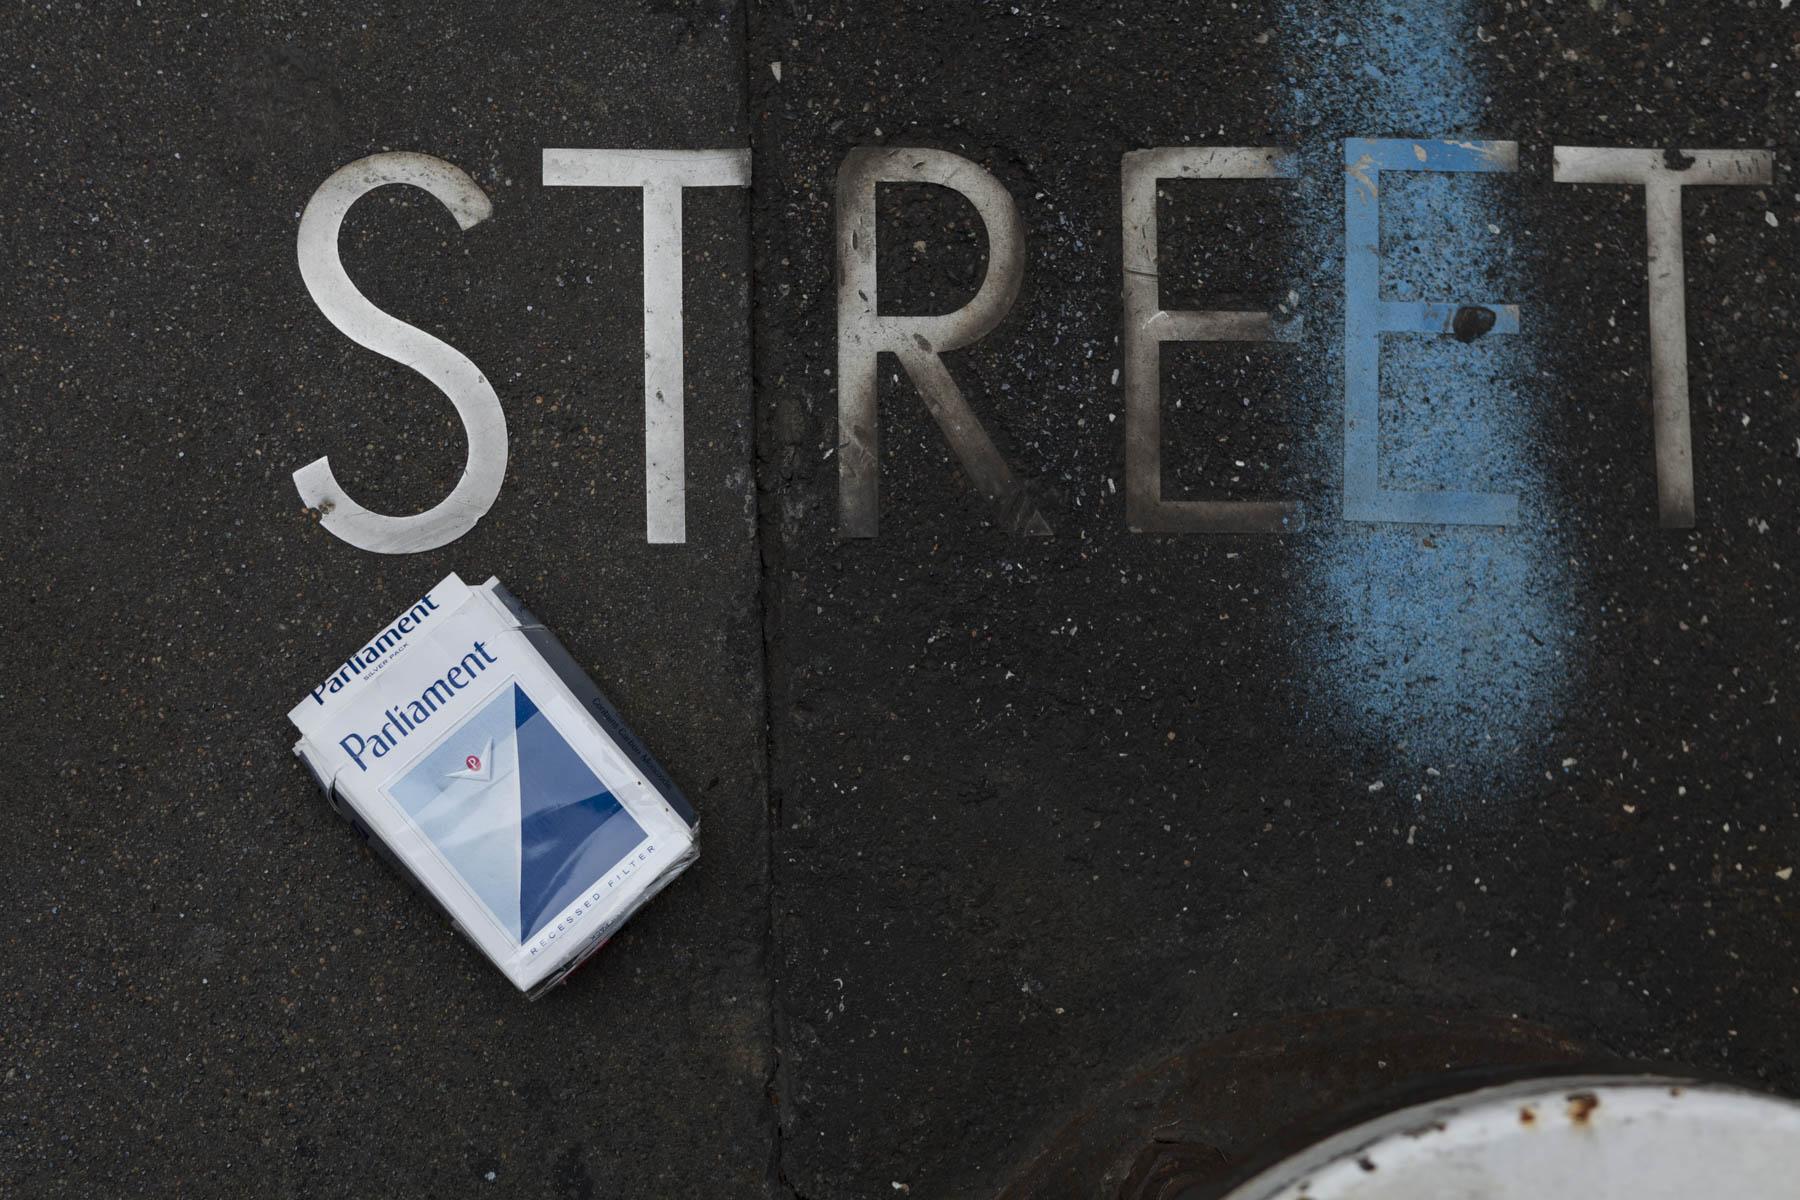 paul_salcido_DeathByDesignStreet.jpg